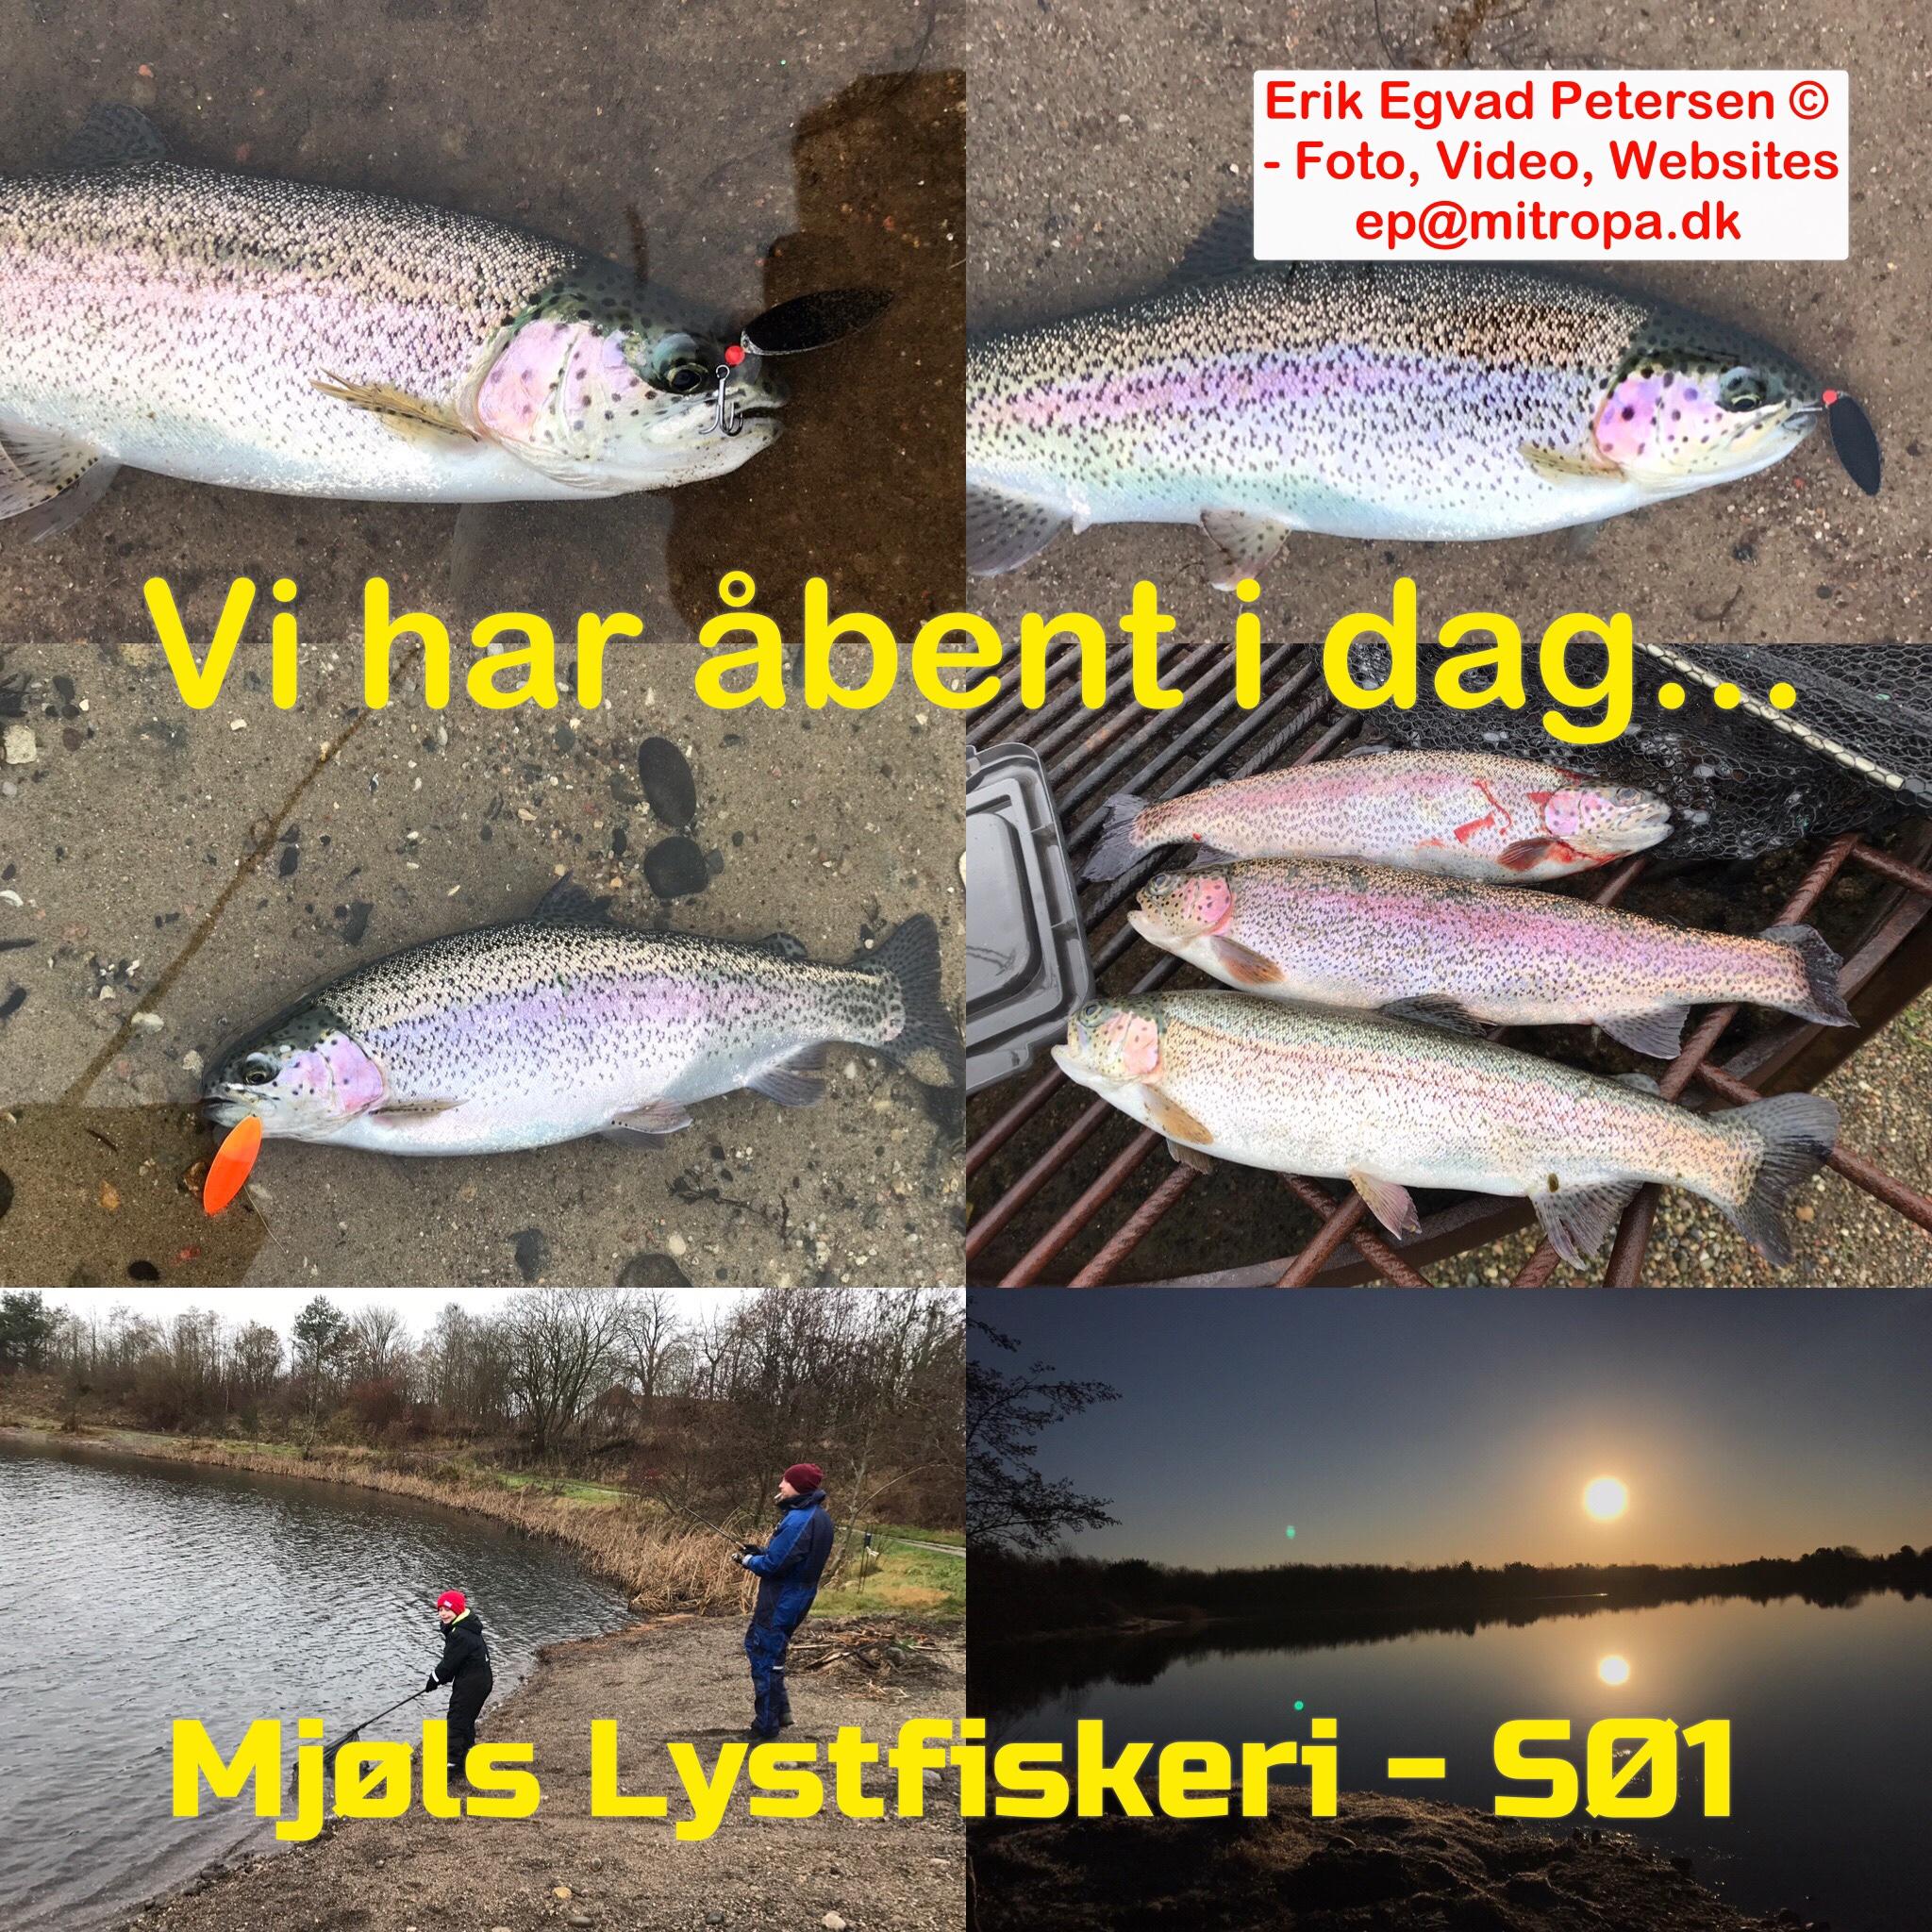 Mjøls Lystfiskeri: Vi har åbent i dag – både SØ1 og SØ2